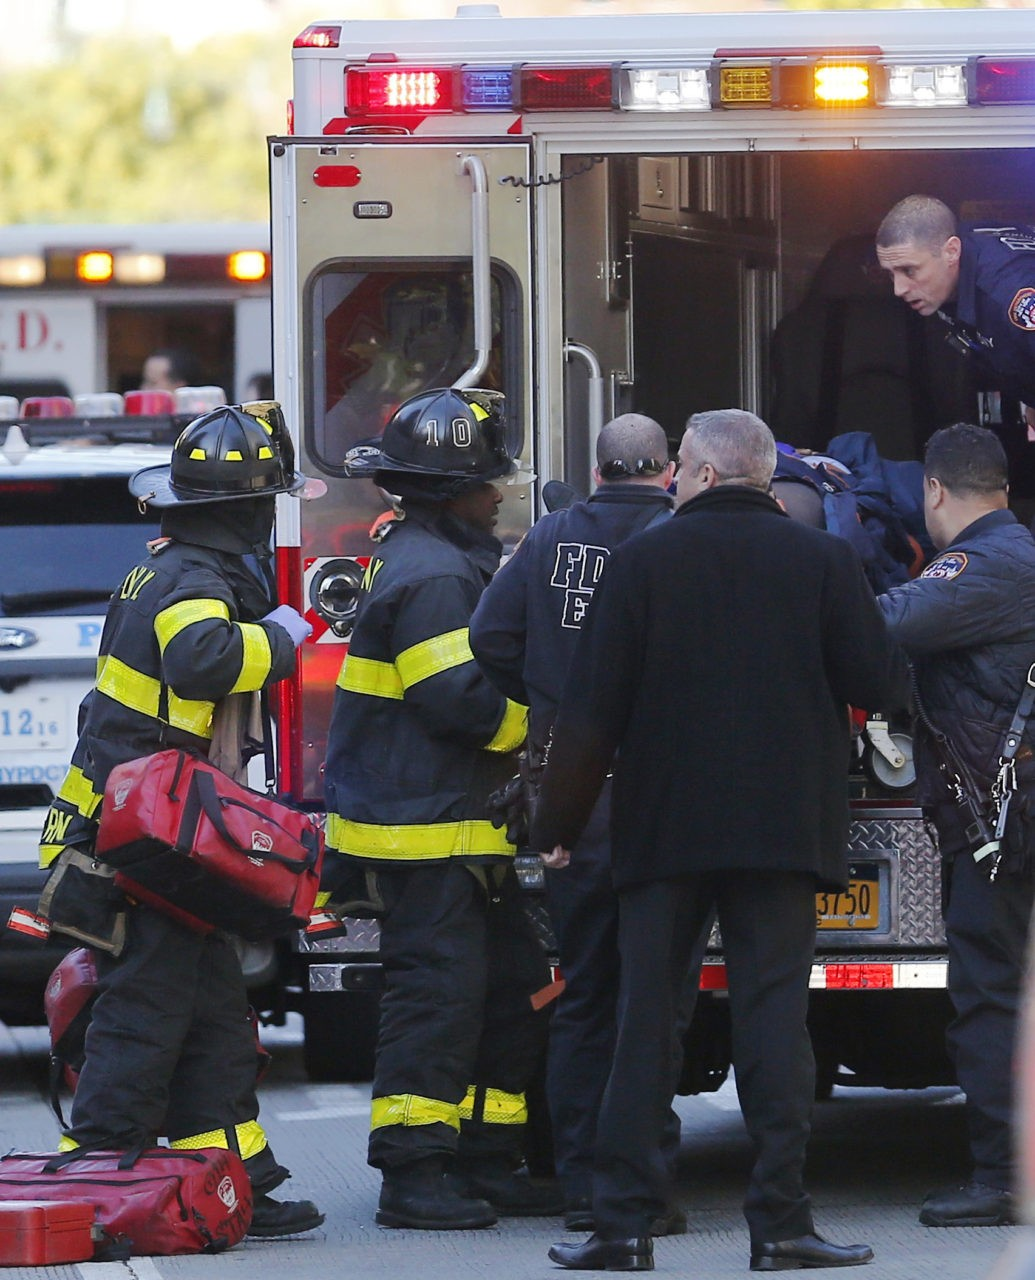 Eight Dead After Truck Driver Runs Down Pedestrians In NYC